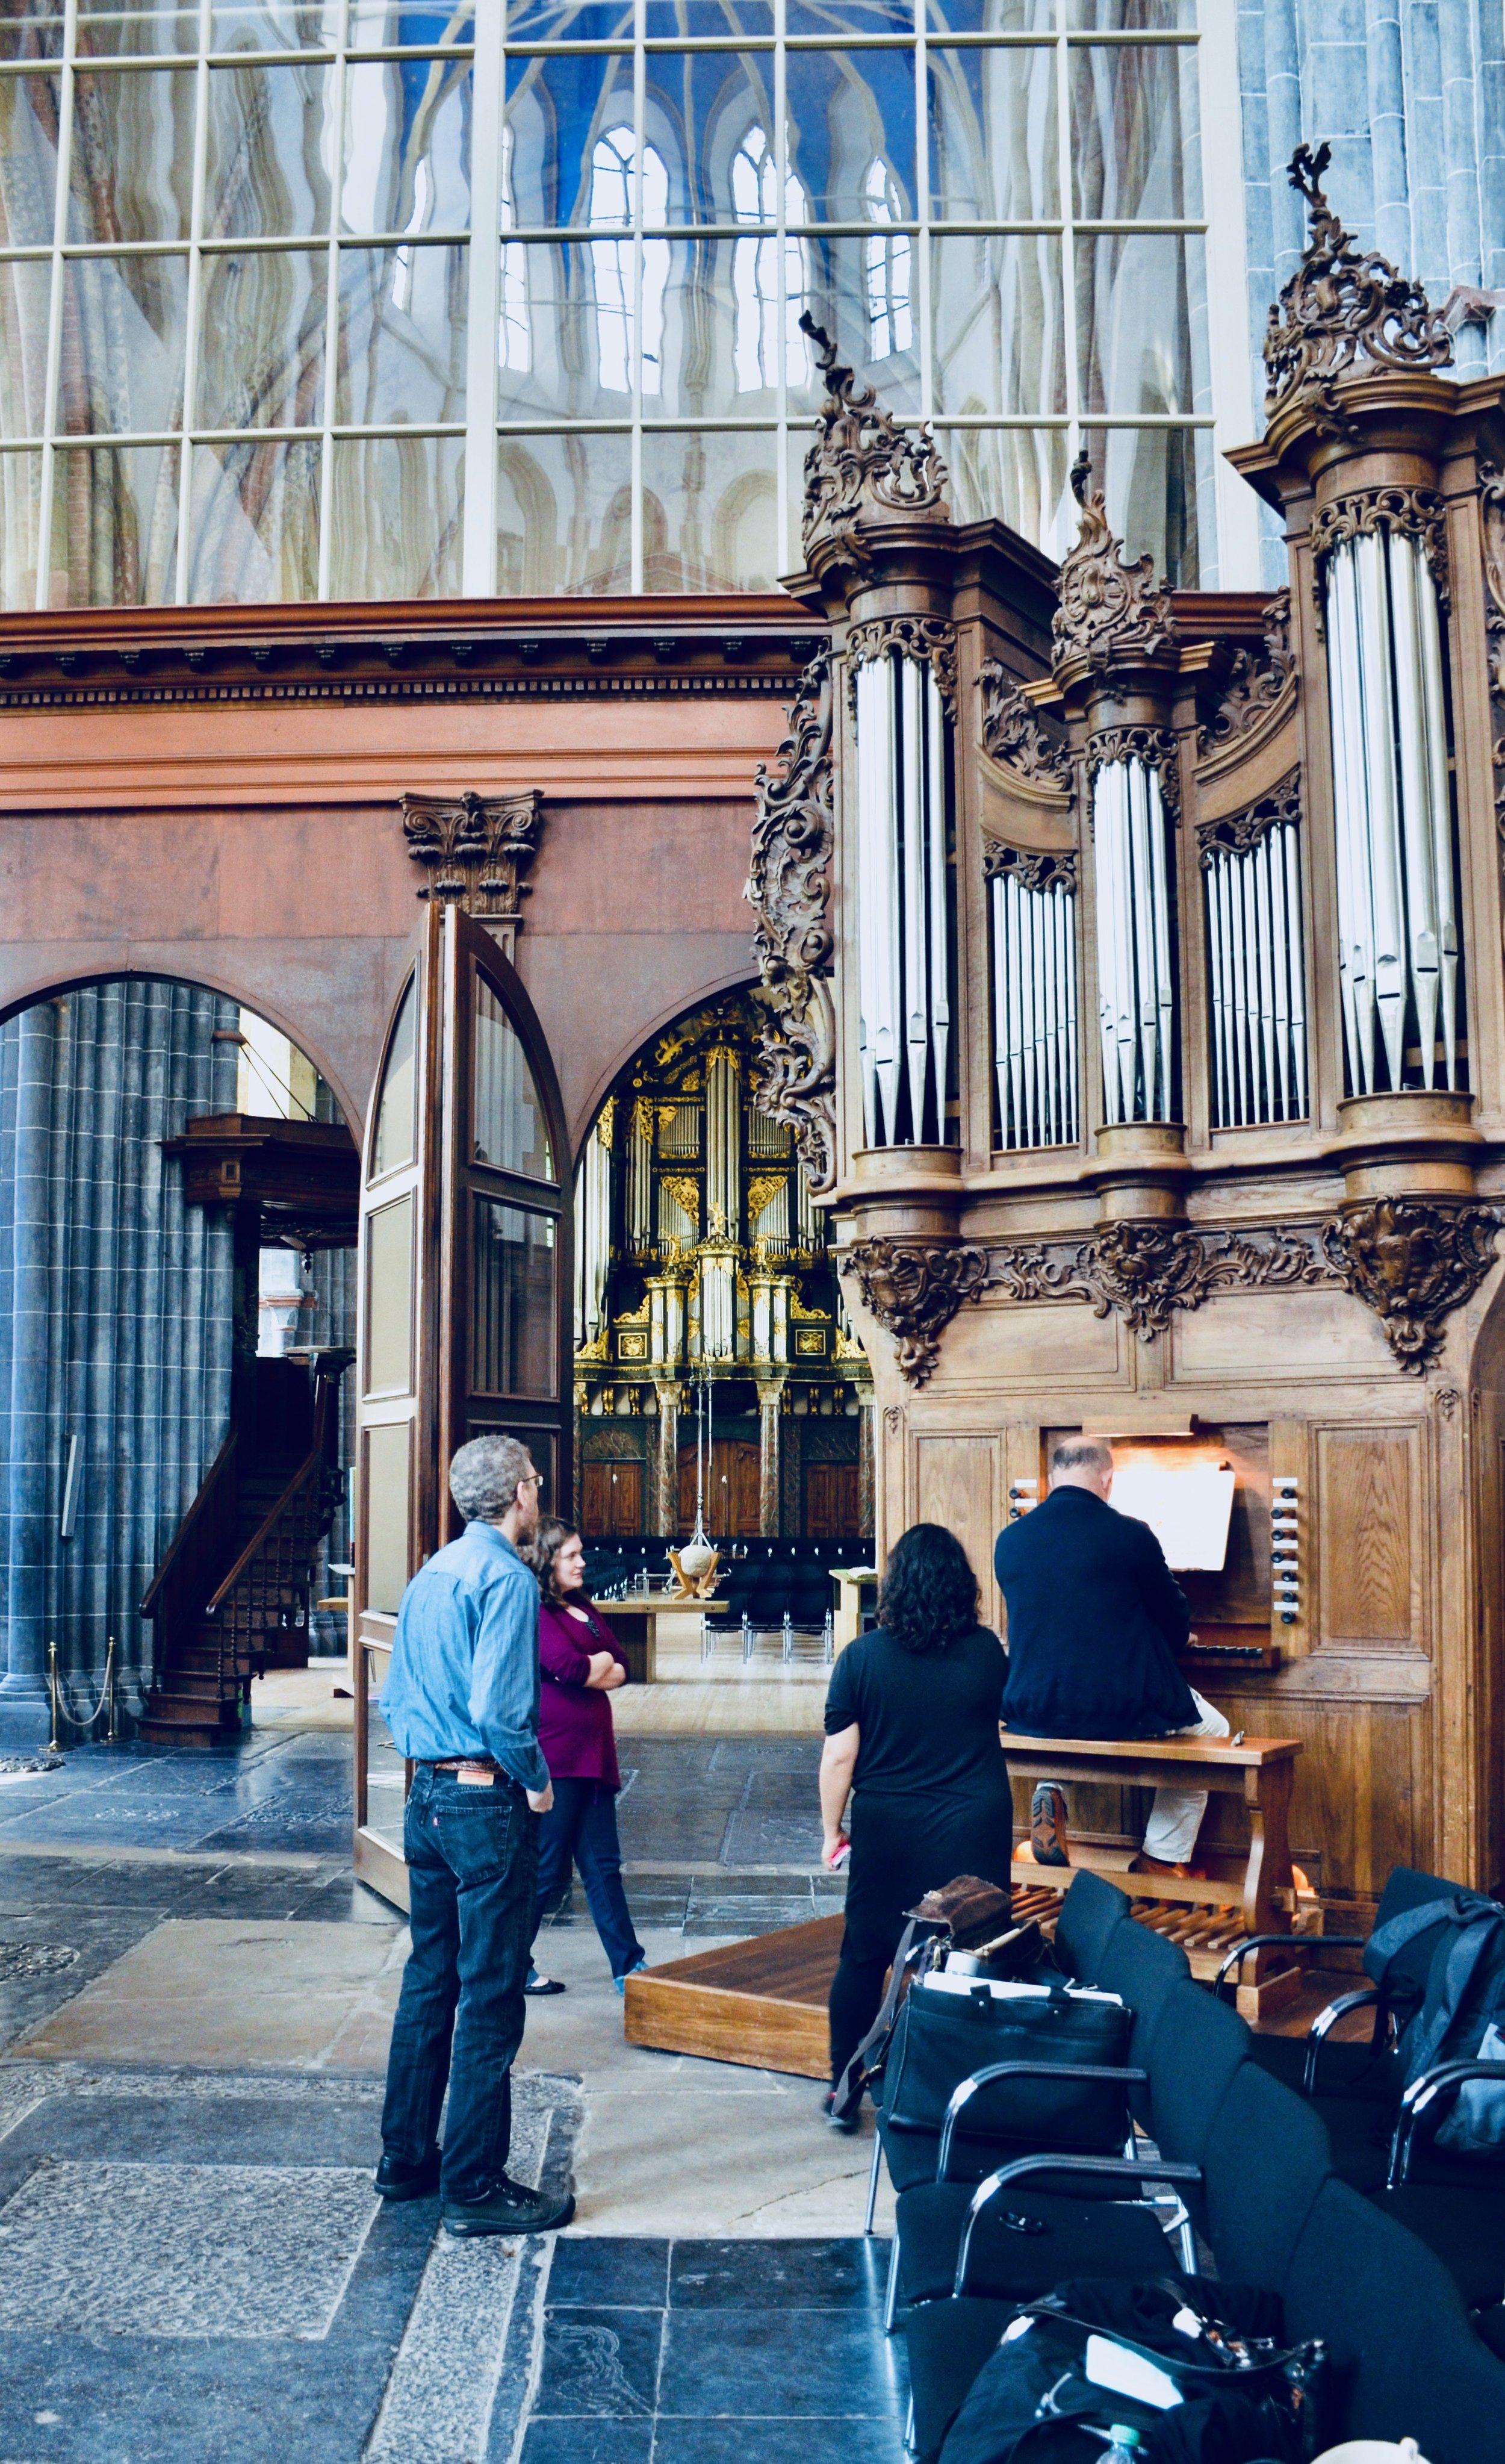 Erwin Wiersinga demonstrates the 1742 Le Picard organ in Martinikerk, Groningen.